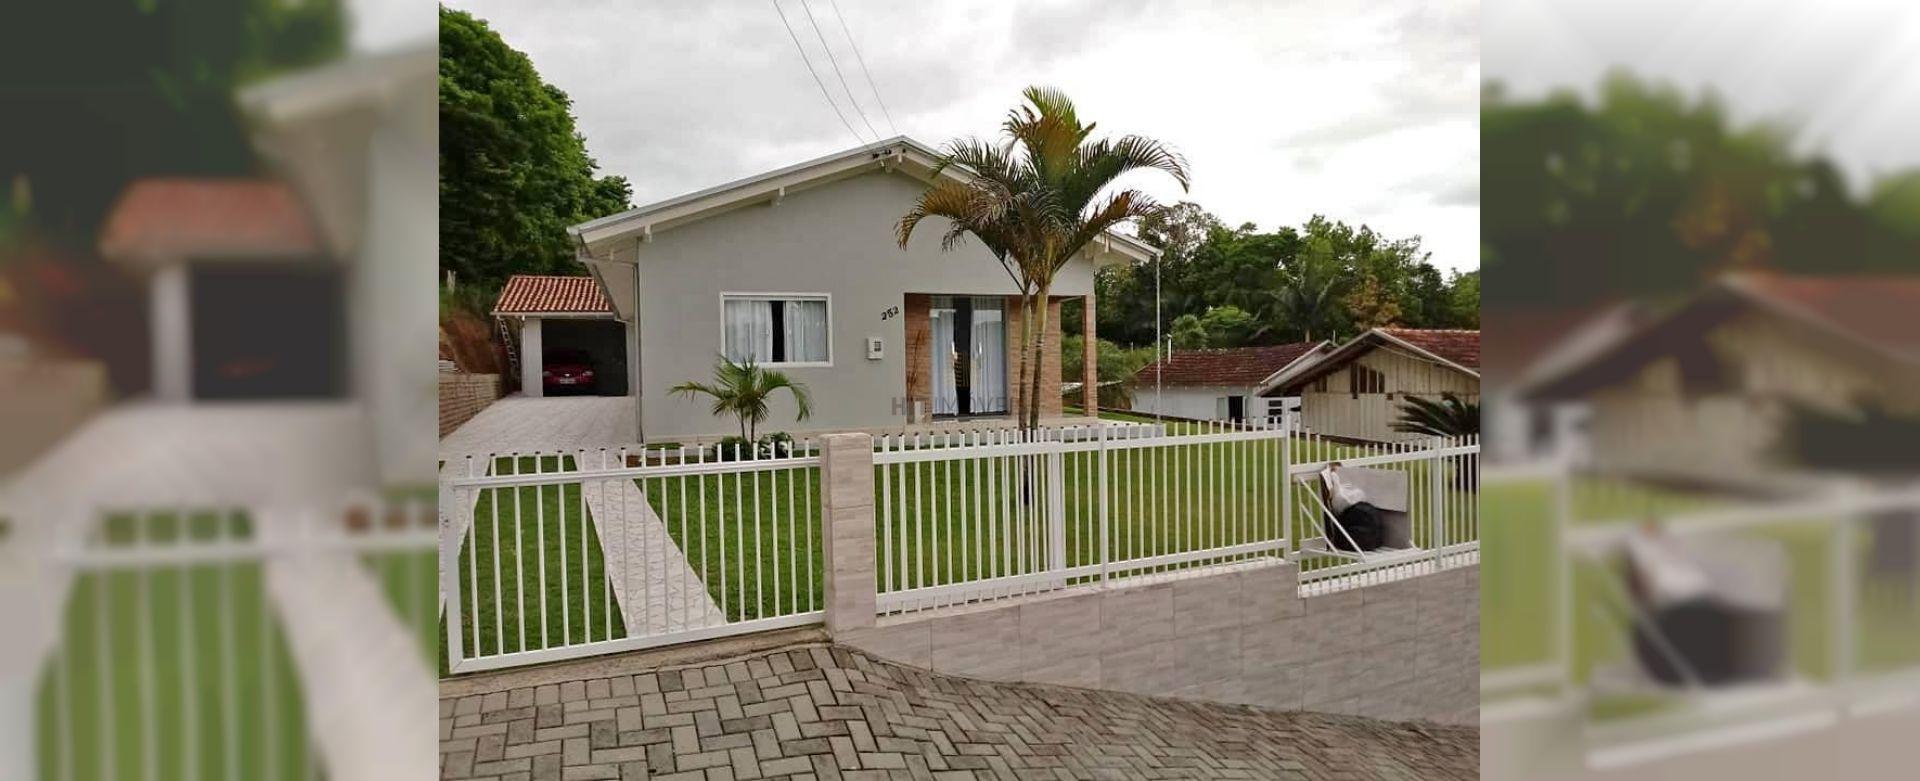 Casa bairro Gruta, Ituporanga - Ituporanga/SC, gruta